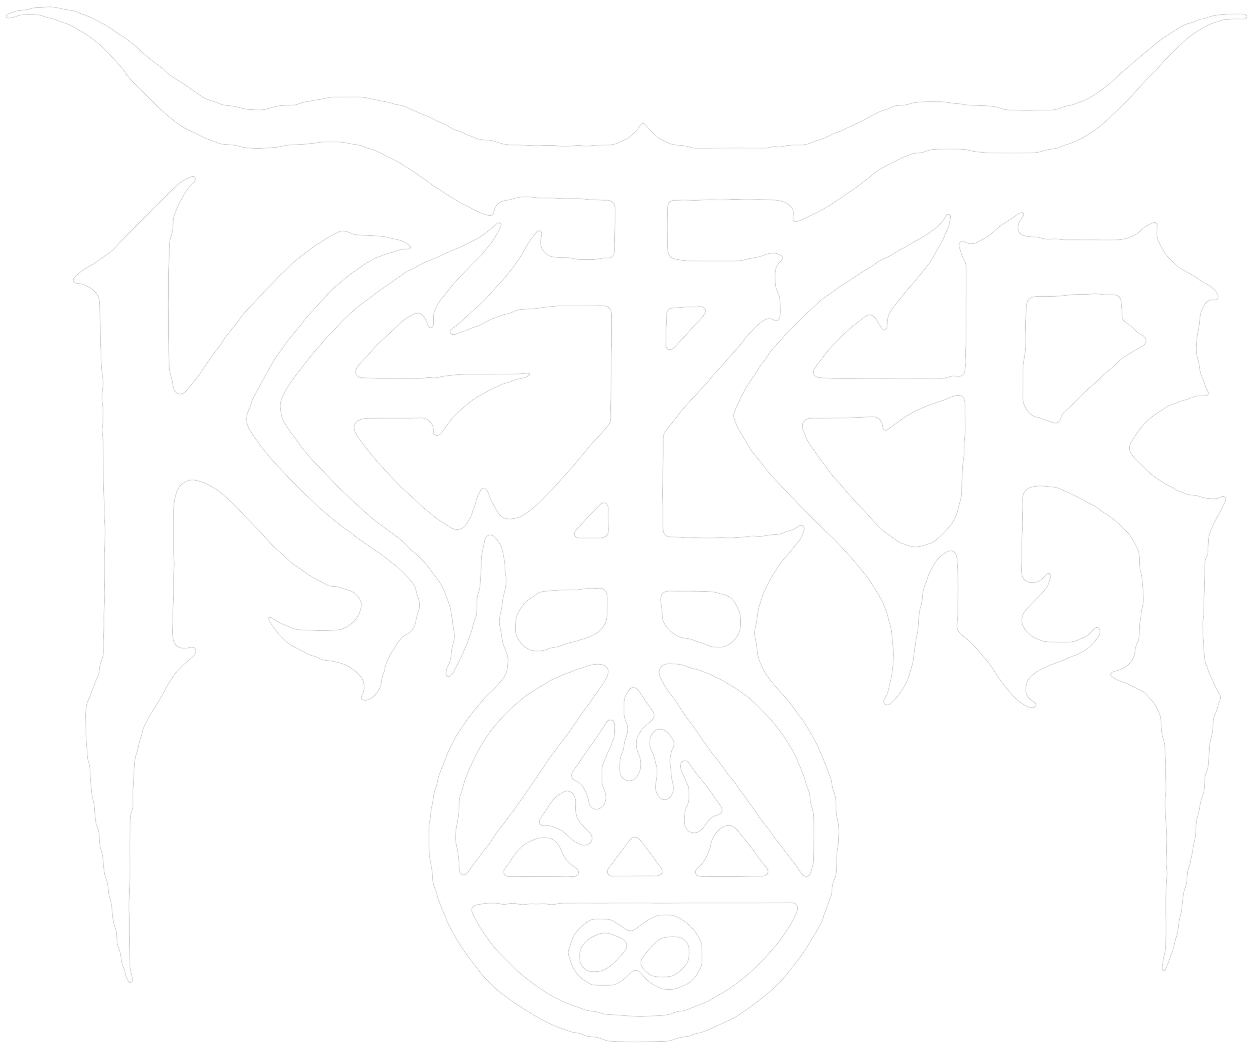 Ketzer - Logo